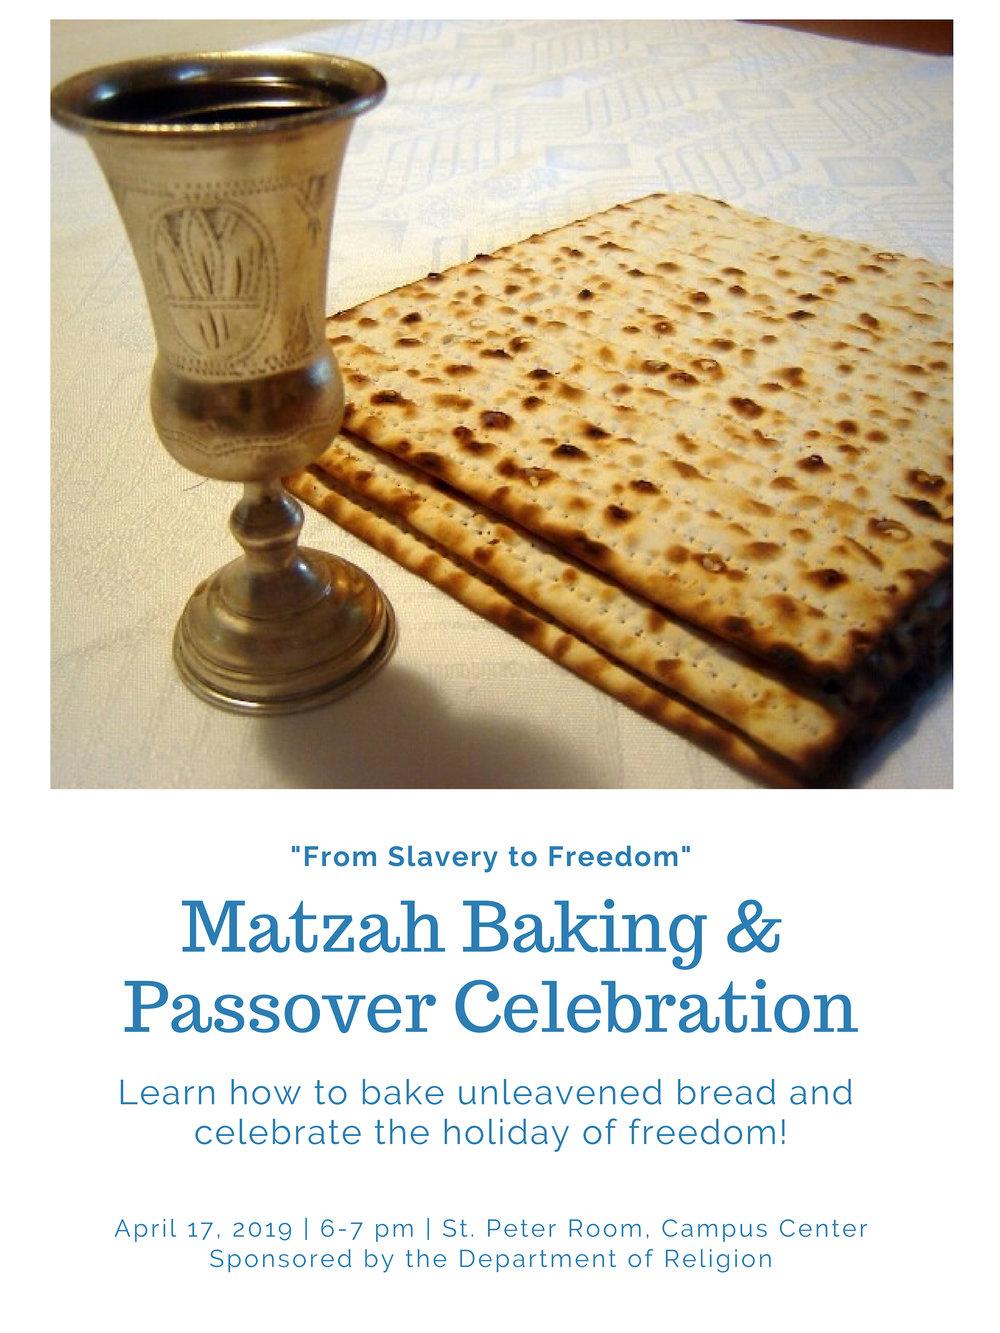 Matzah Baking and Passover Celebration (April 17, 2019).jpg